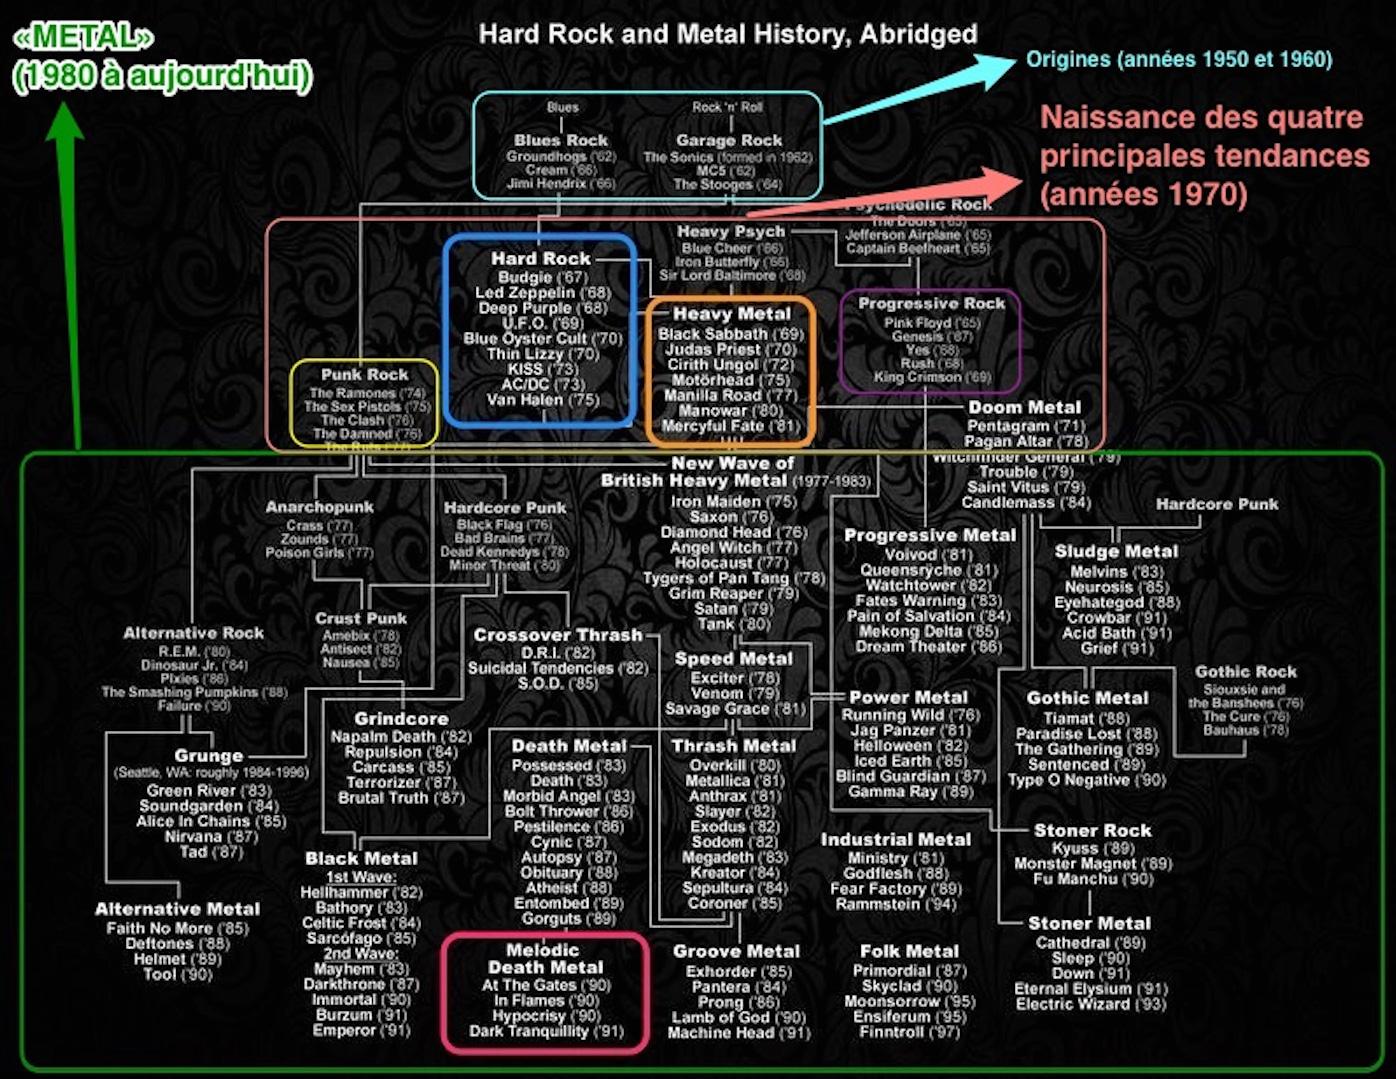 https://www.icm-musique.fr/content/uploads/2014/12/Histoire-du-metal1.jpg